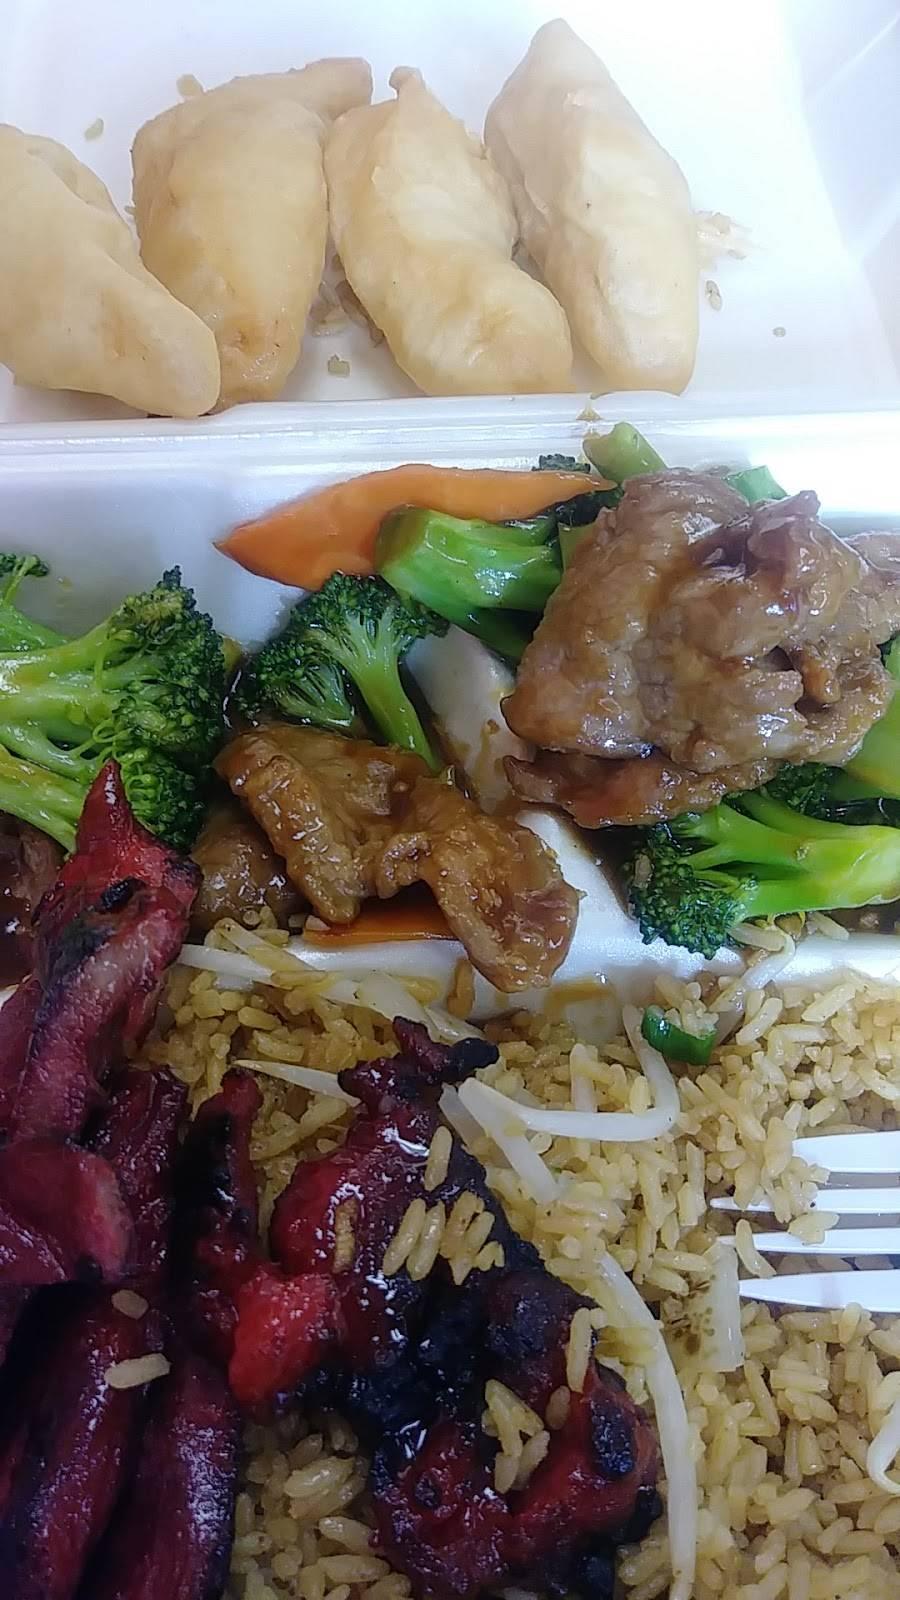 China Sails | restaurant | 28 Union St, Lynn, MA 01902, USA | 7815992213 OR +1 781-599-2213